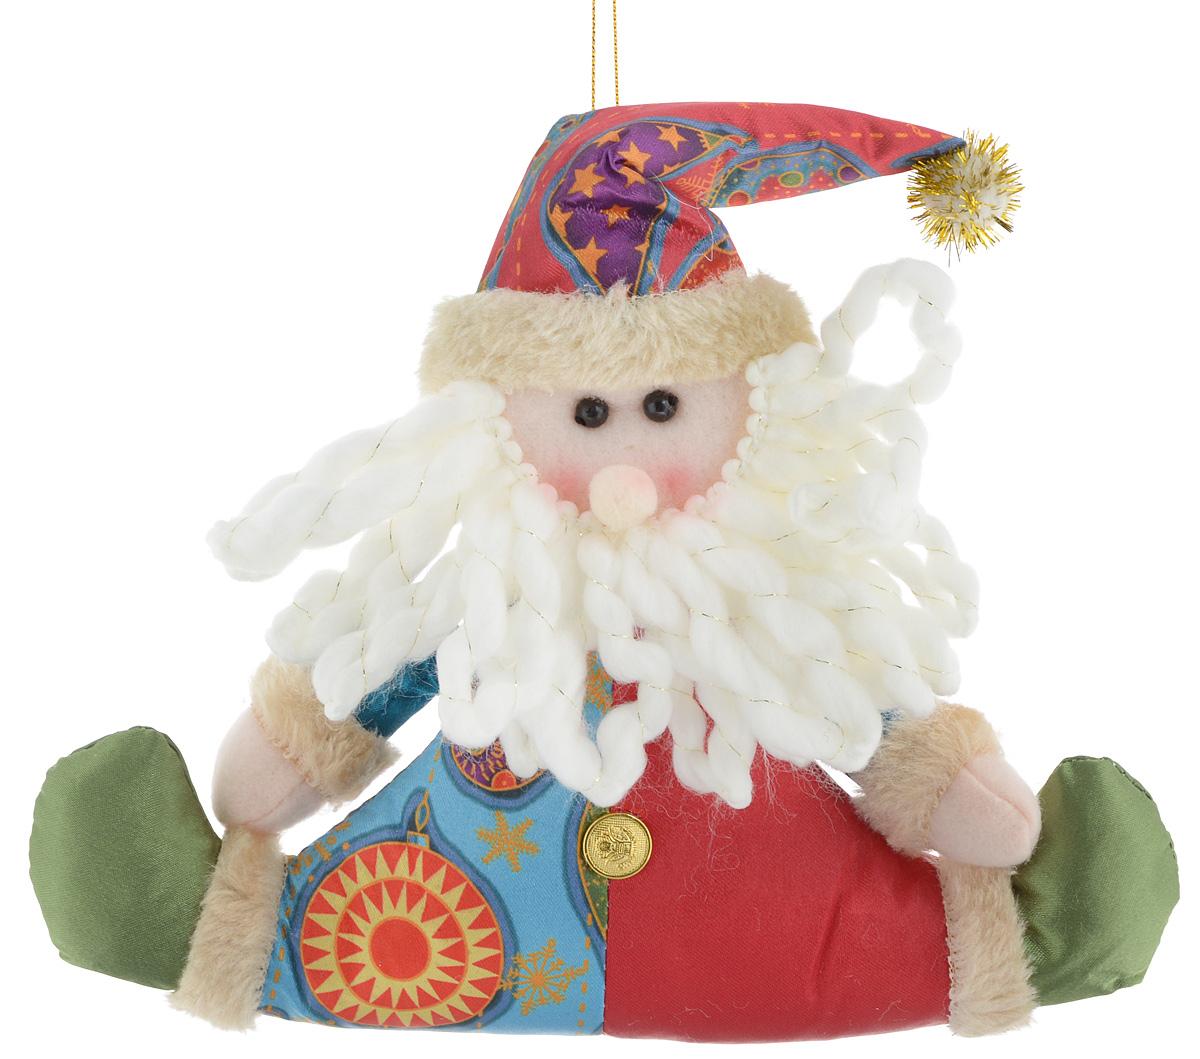 Украшение новогоднее подвесное Win Max Дед Мороз, 17 х 20,5 см набор сундучков win max 25 х 17 х 13 см 2 шт 83605